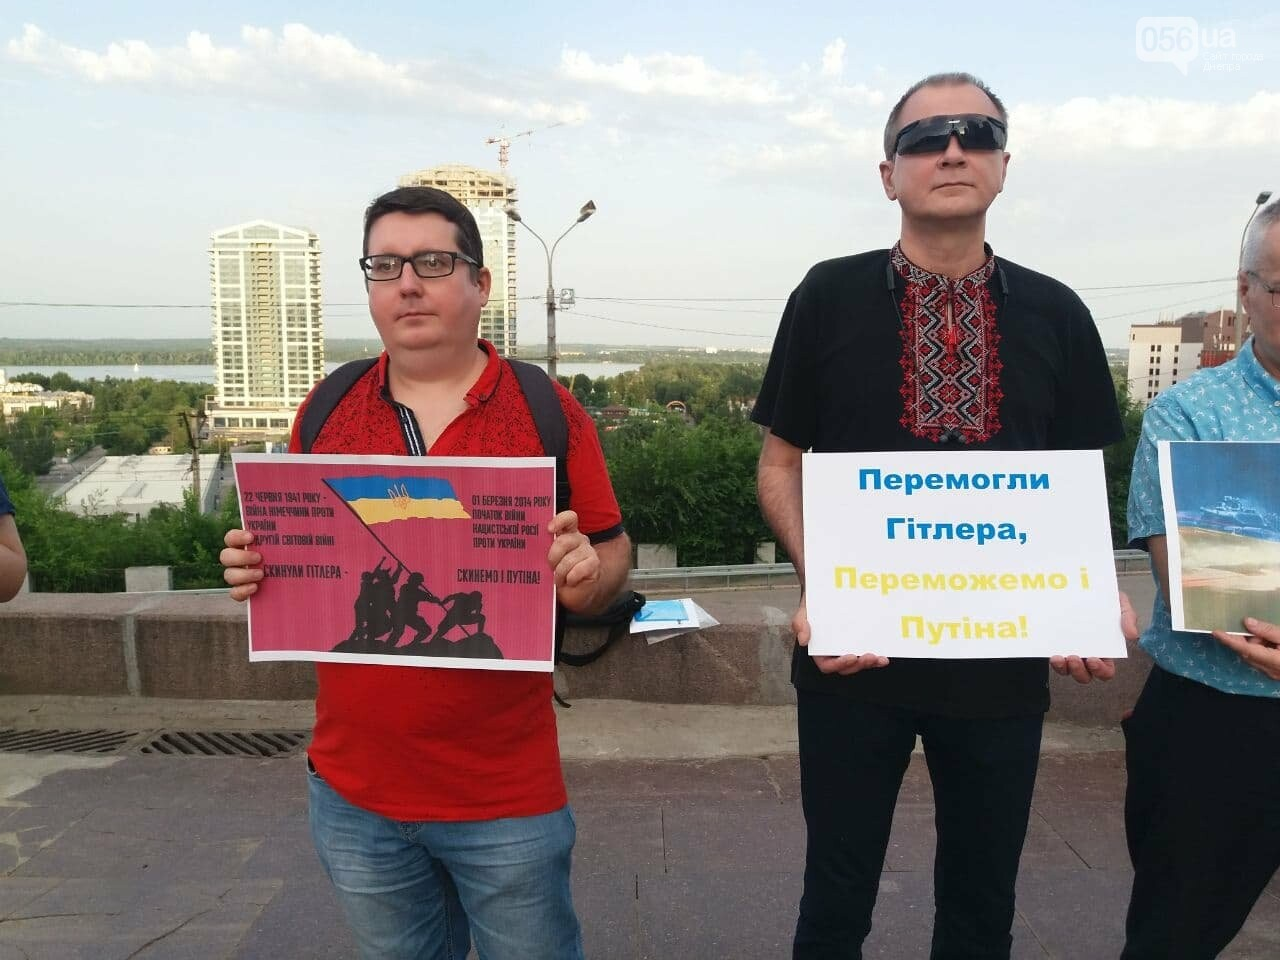 В Днепре активисты заявили, что победят Путина, - ФОТО, ВИДЕО, фото-1